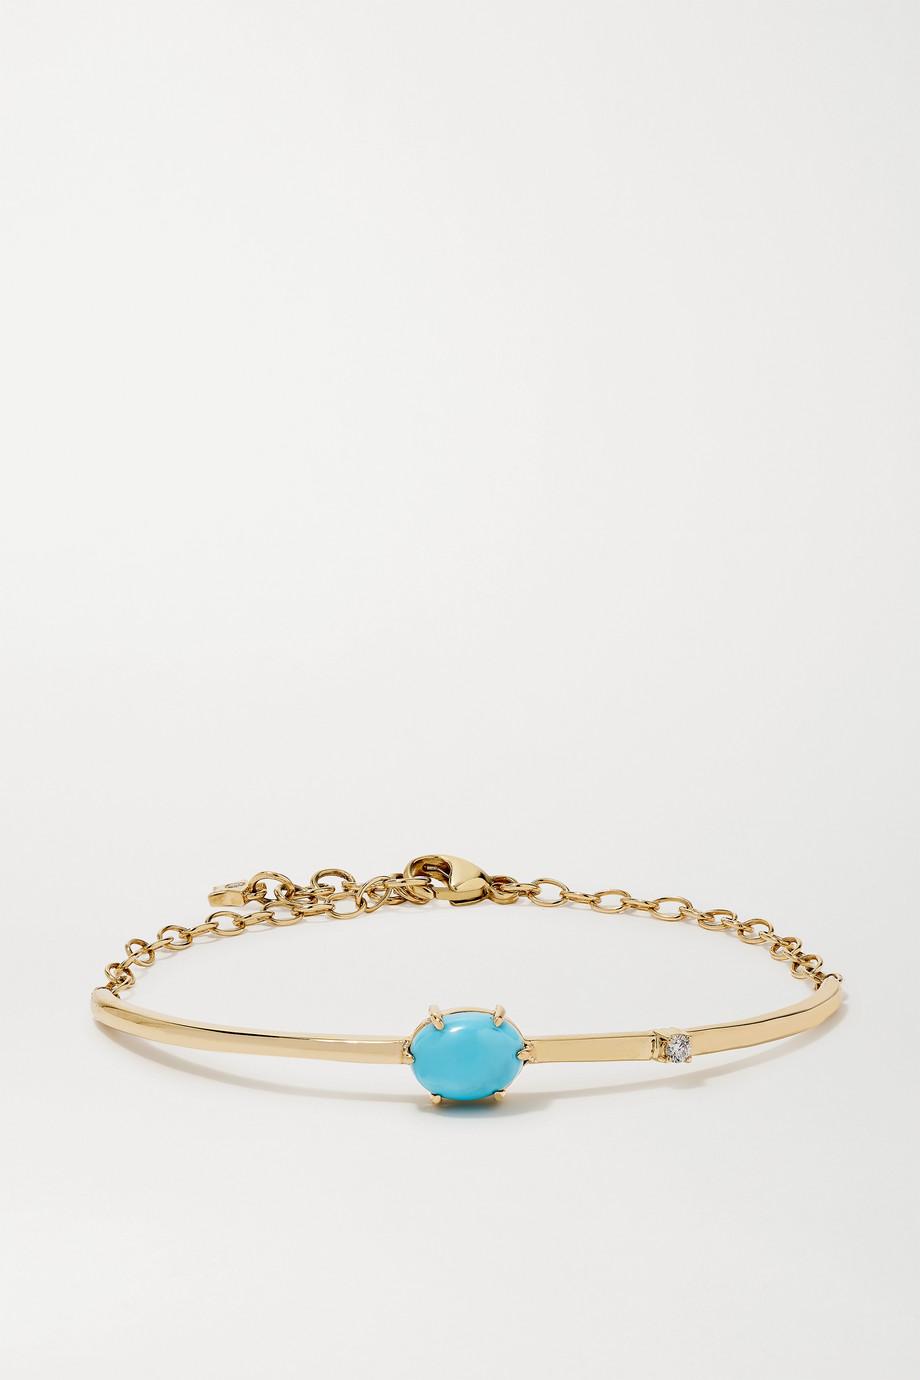 Andrea Fohrman Mini Cosmo 14-karat gold, turquoise and diamond bracelet